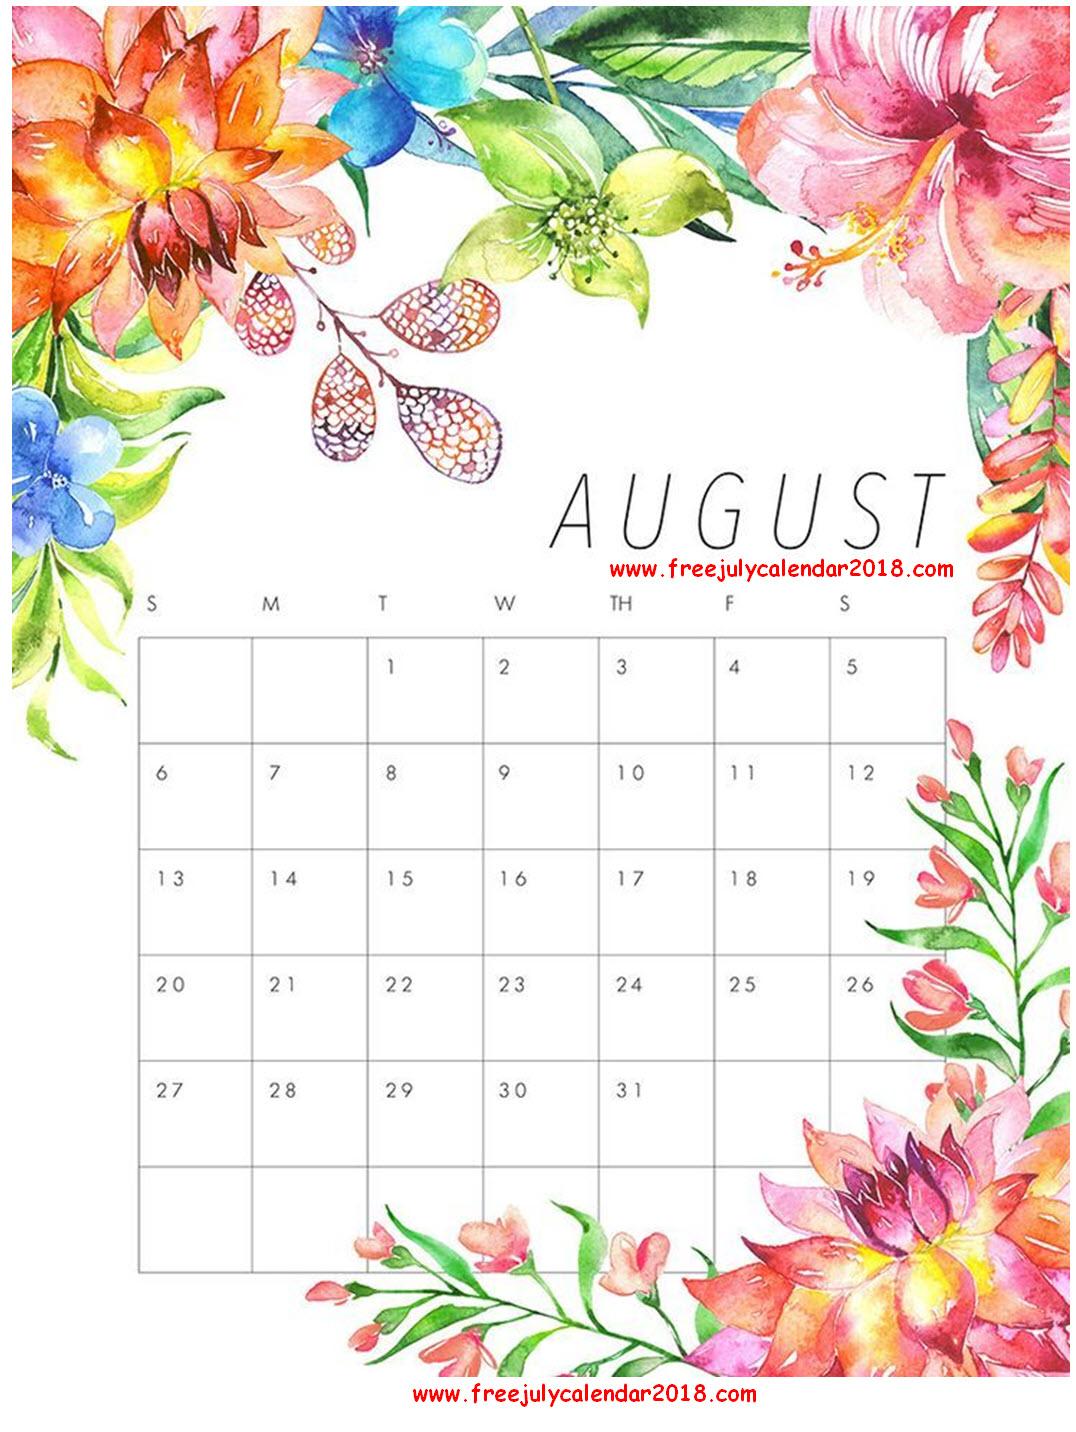 August 2018 Floral Calendar